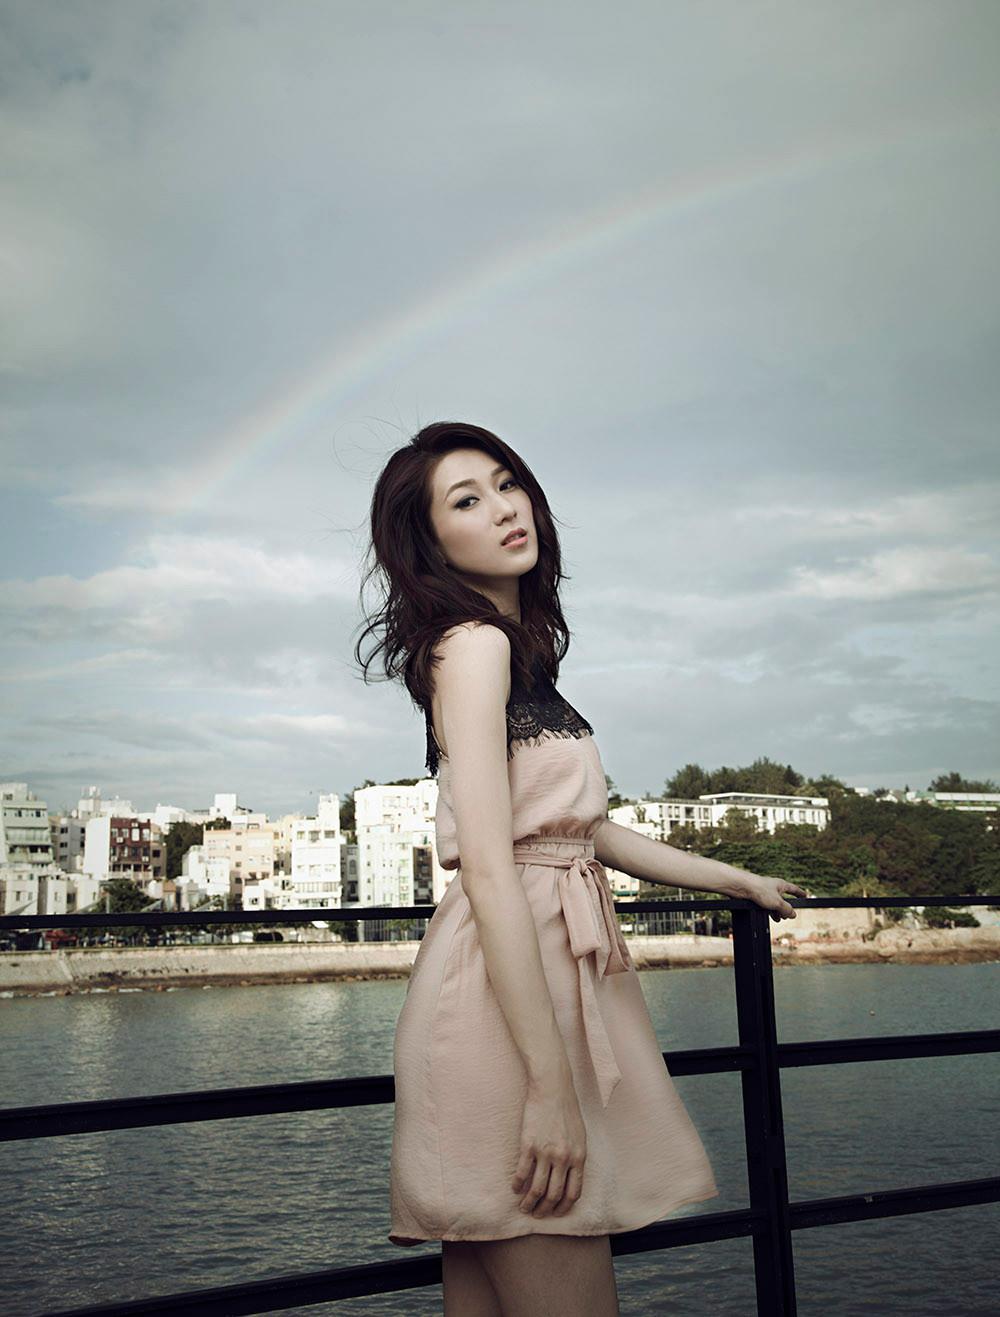 鍾嘉欣 Linda Chung Ka-yan